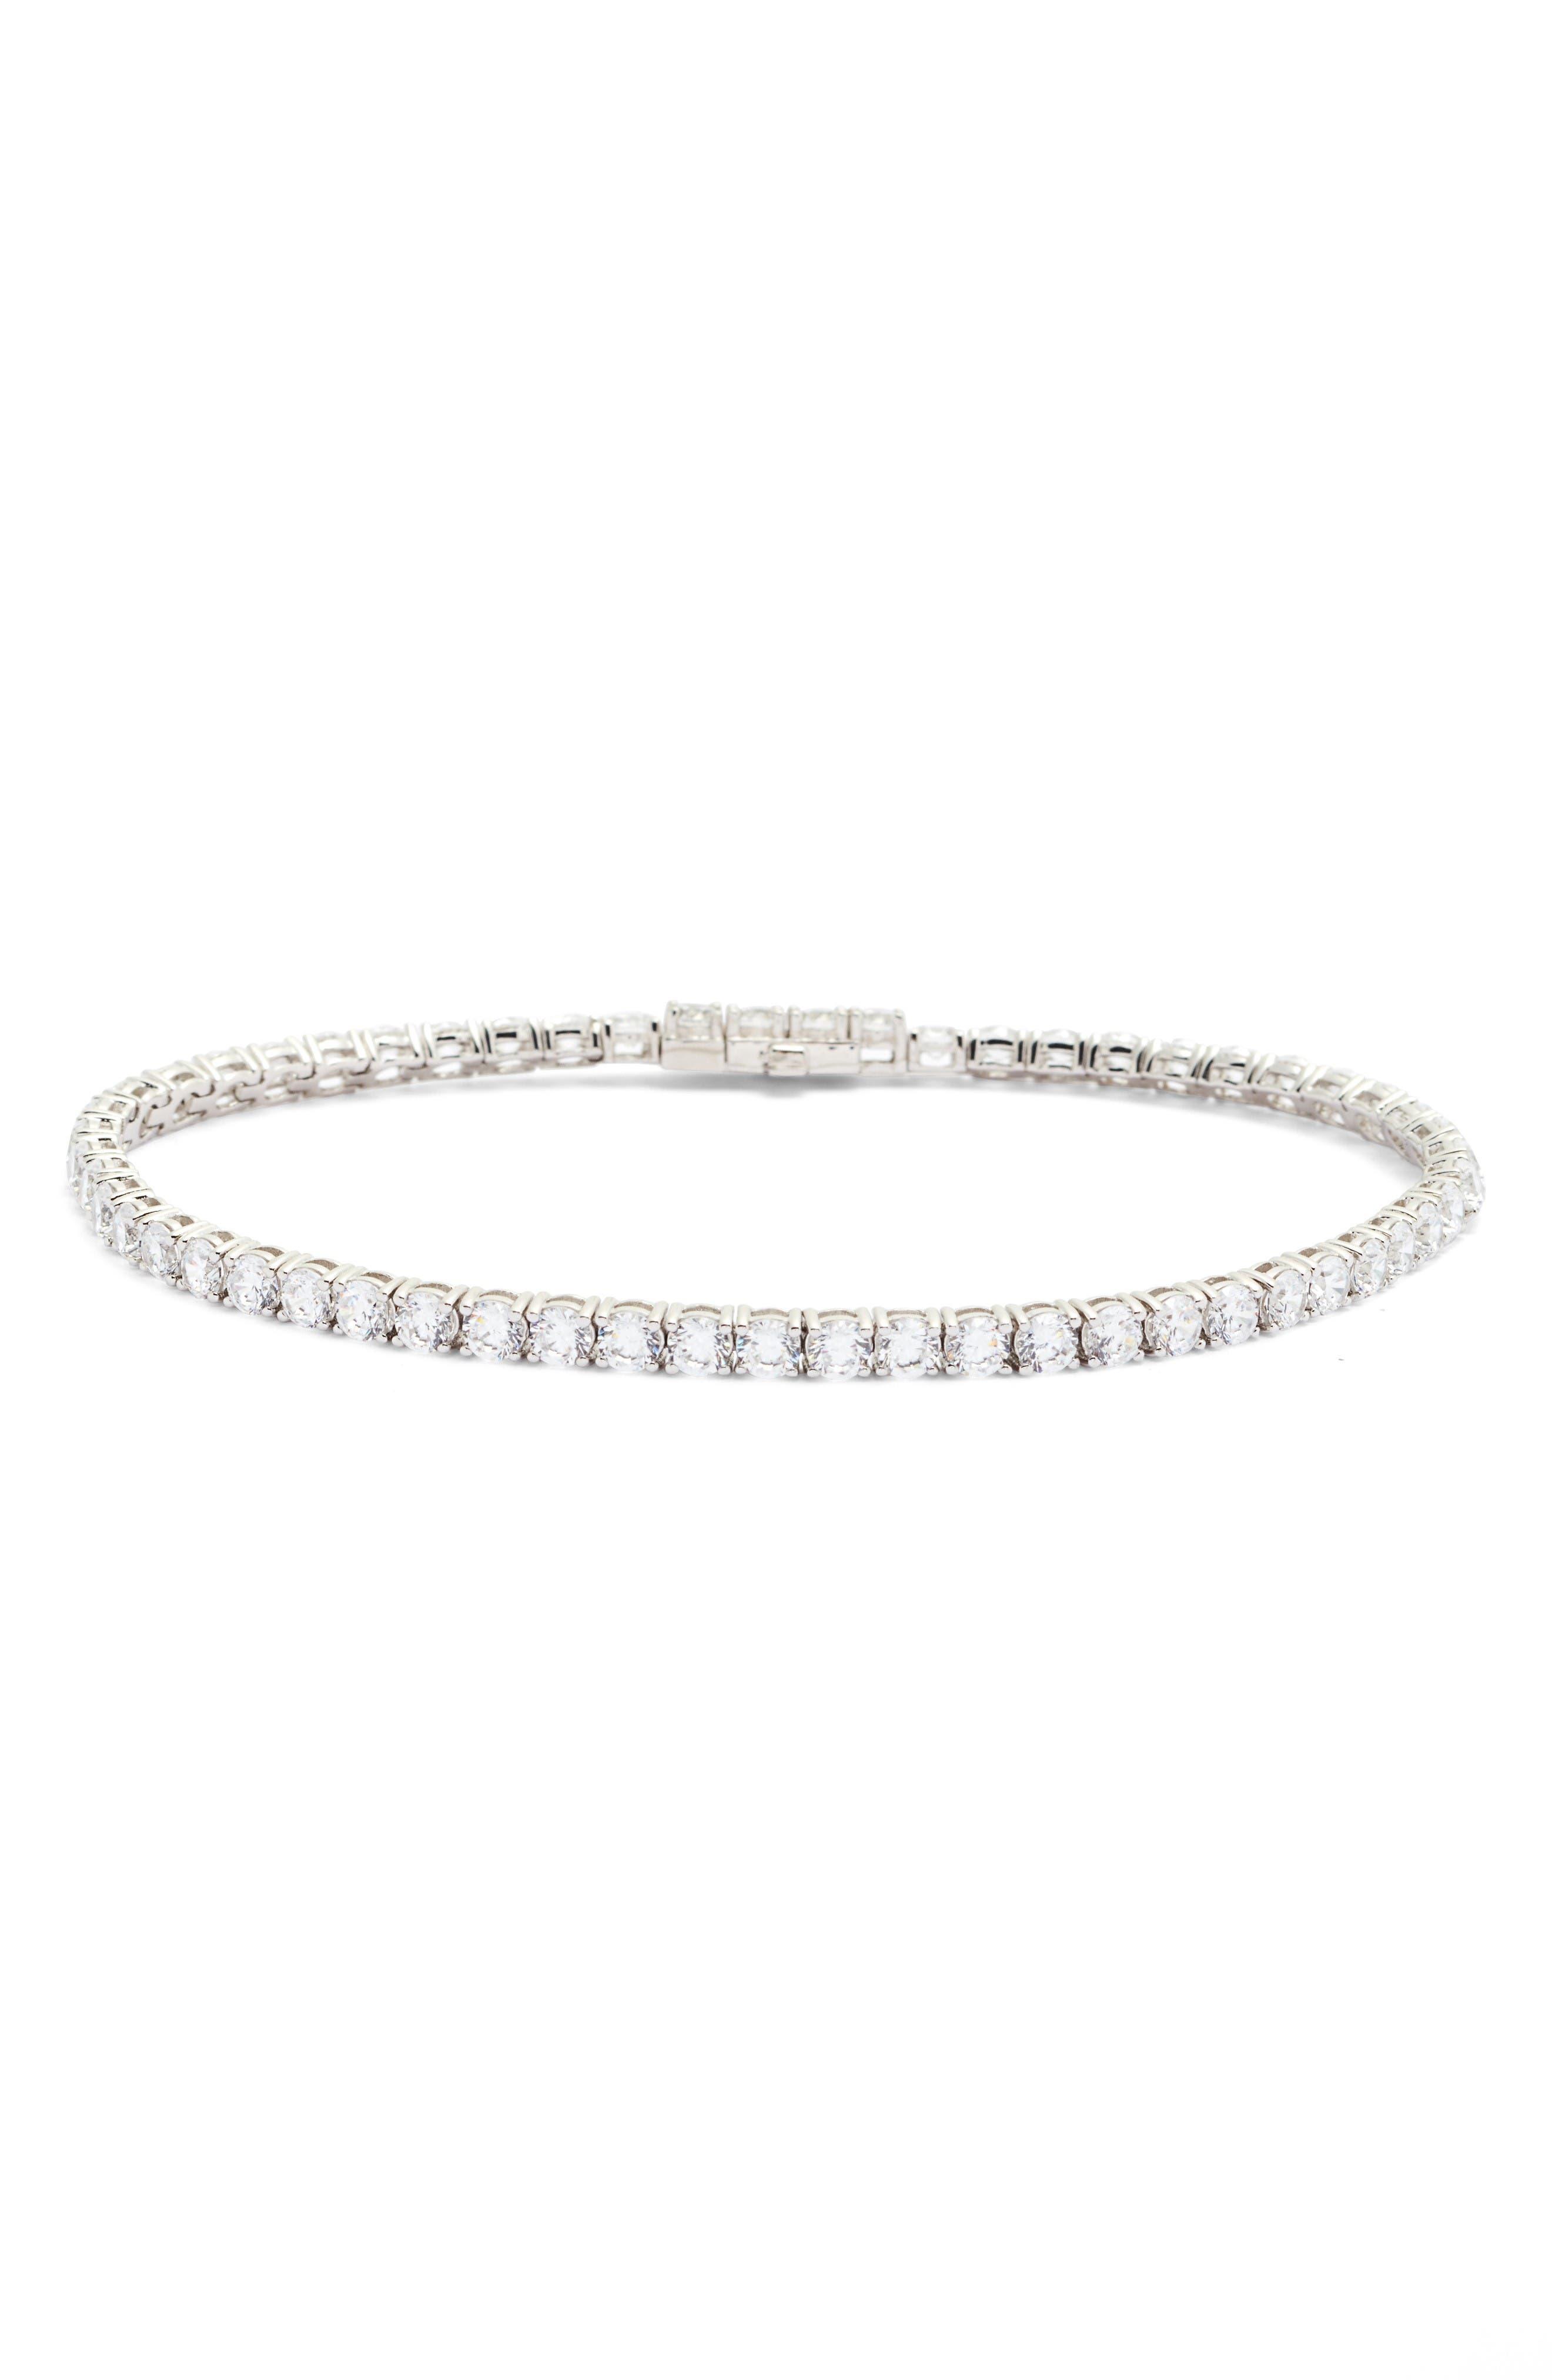 Classic Simulated Diamond Tennis Bracelet,                         Main,                         color, Silver